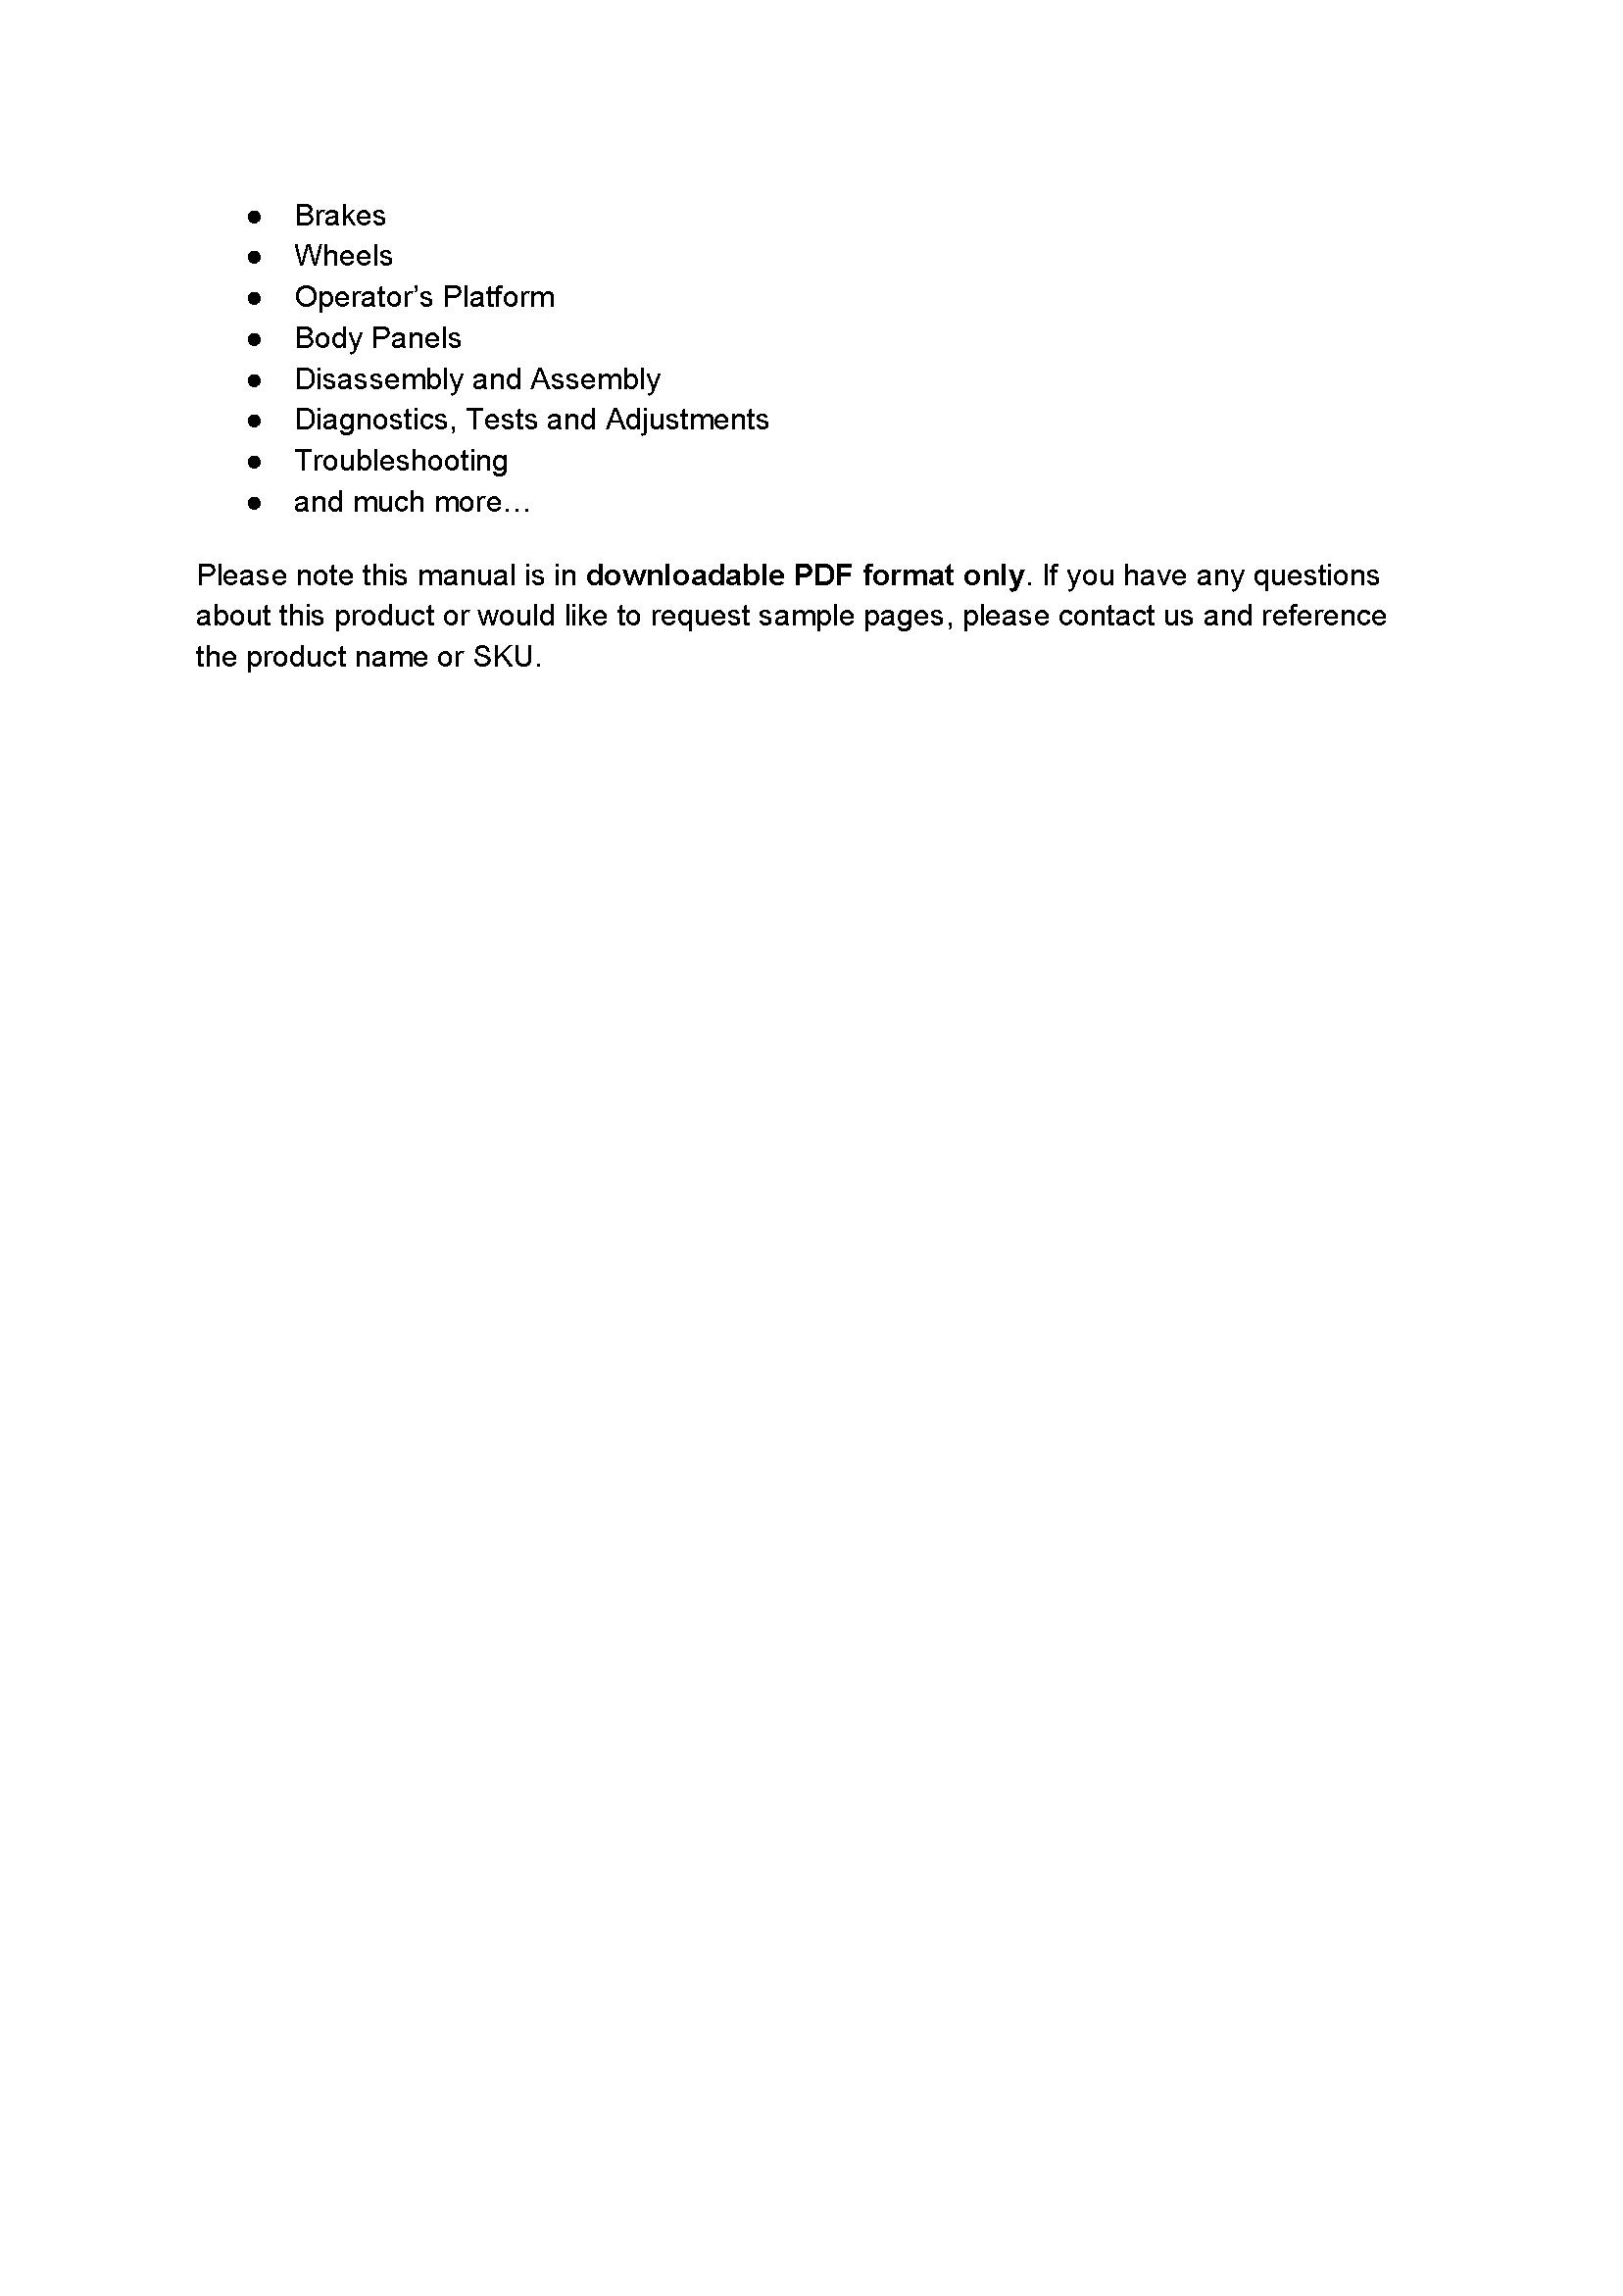 John Deere 1750 manual